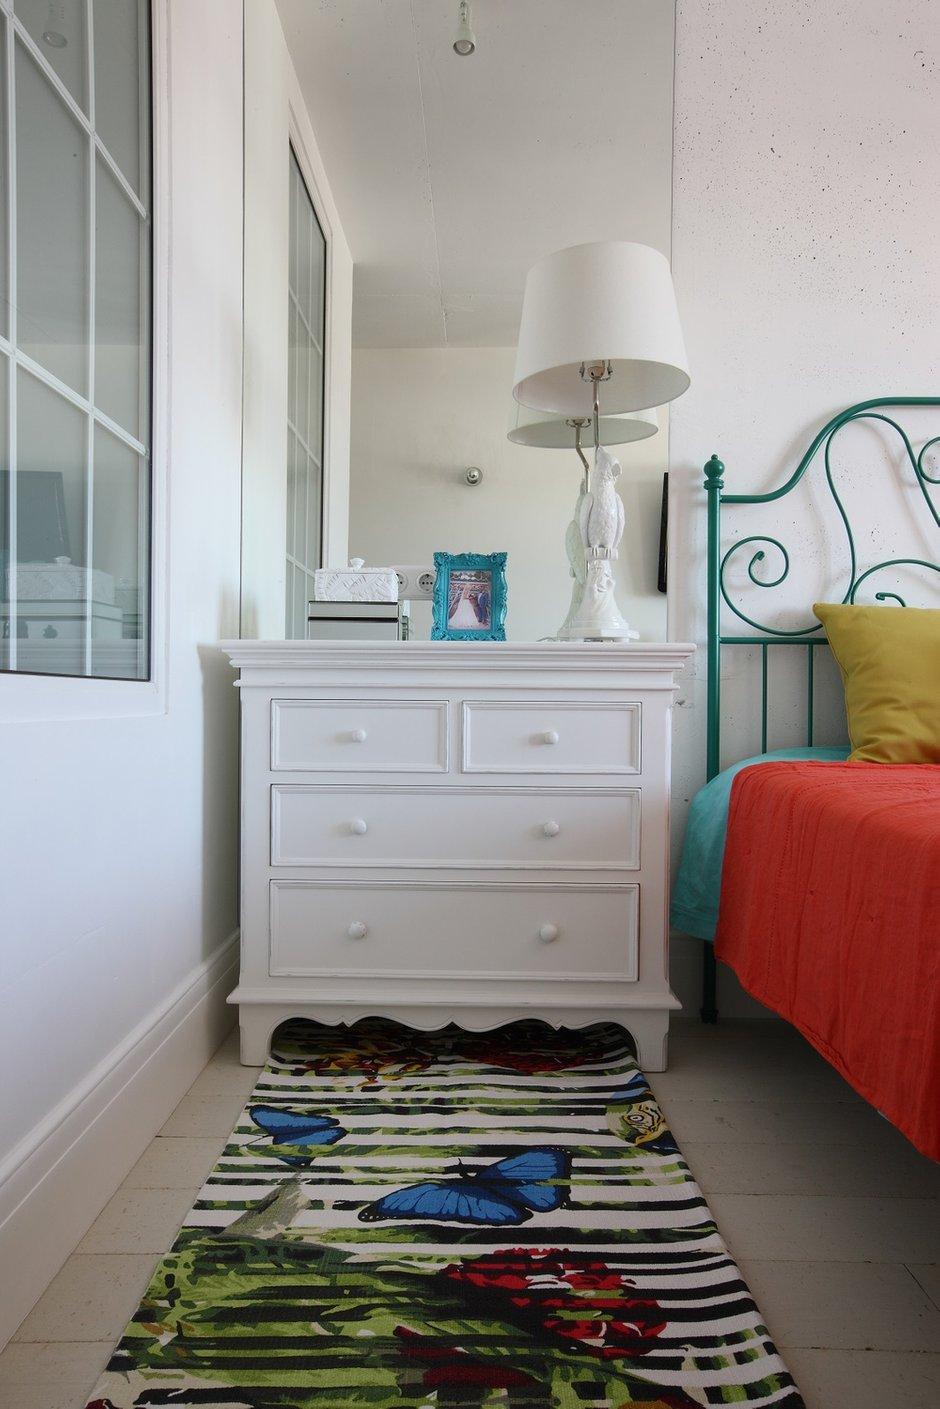 Фотография: Спальня в стиле Прованс и Кантри, Эклектика, Квартира, Проект недели – фото на INMYROOM